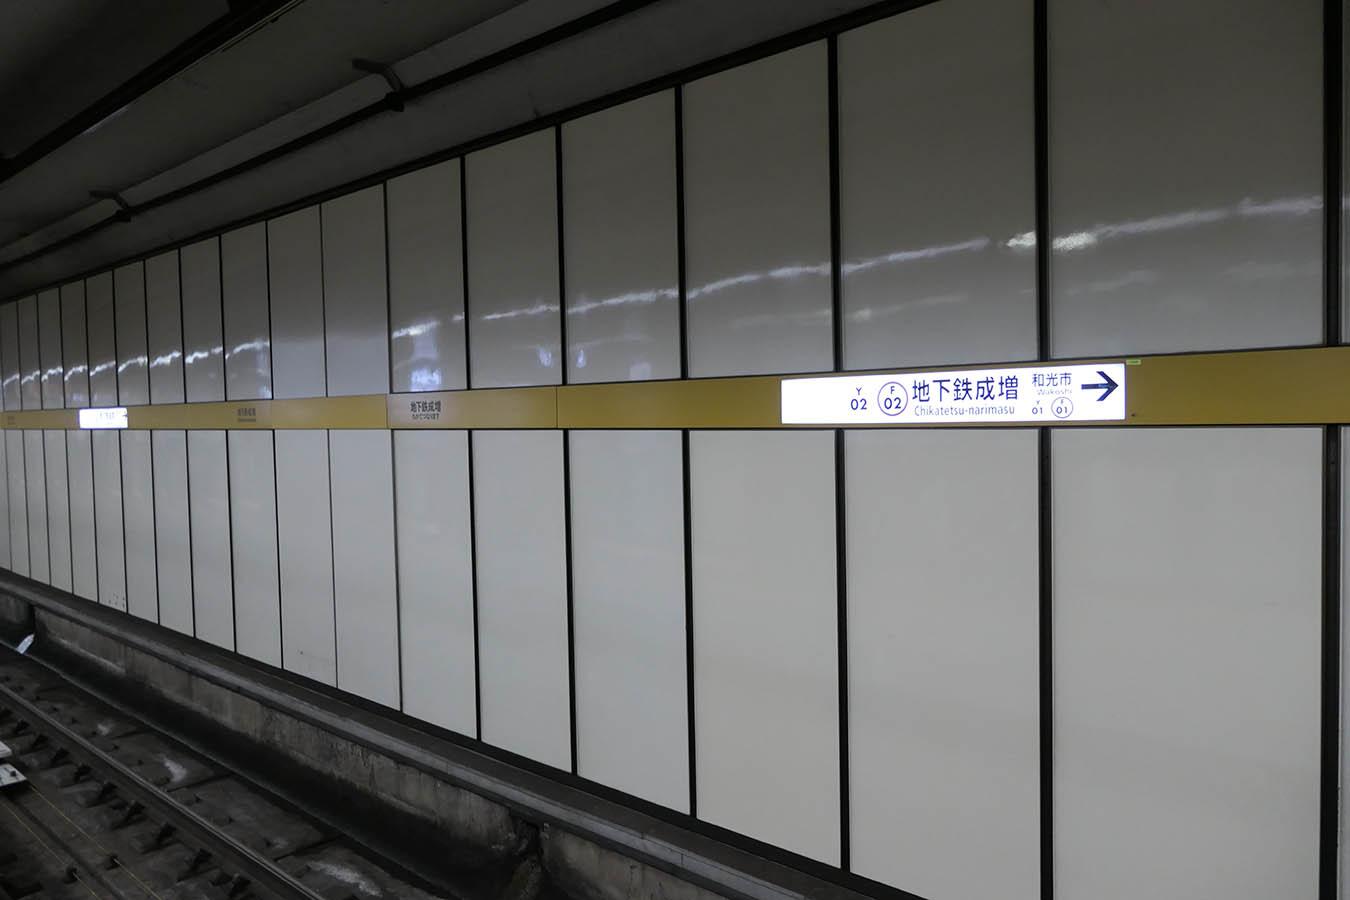 Y02_photo01.jpg